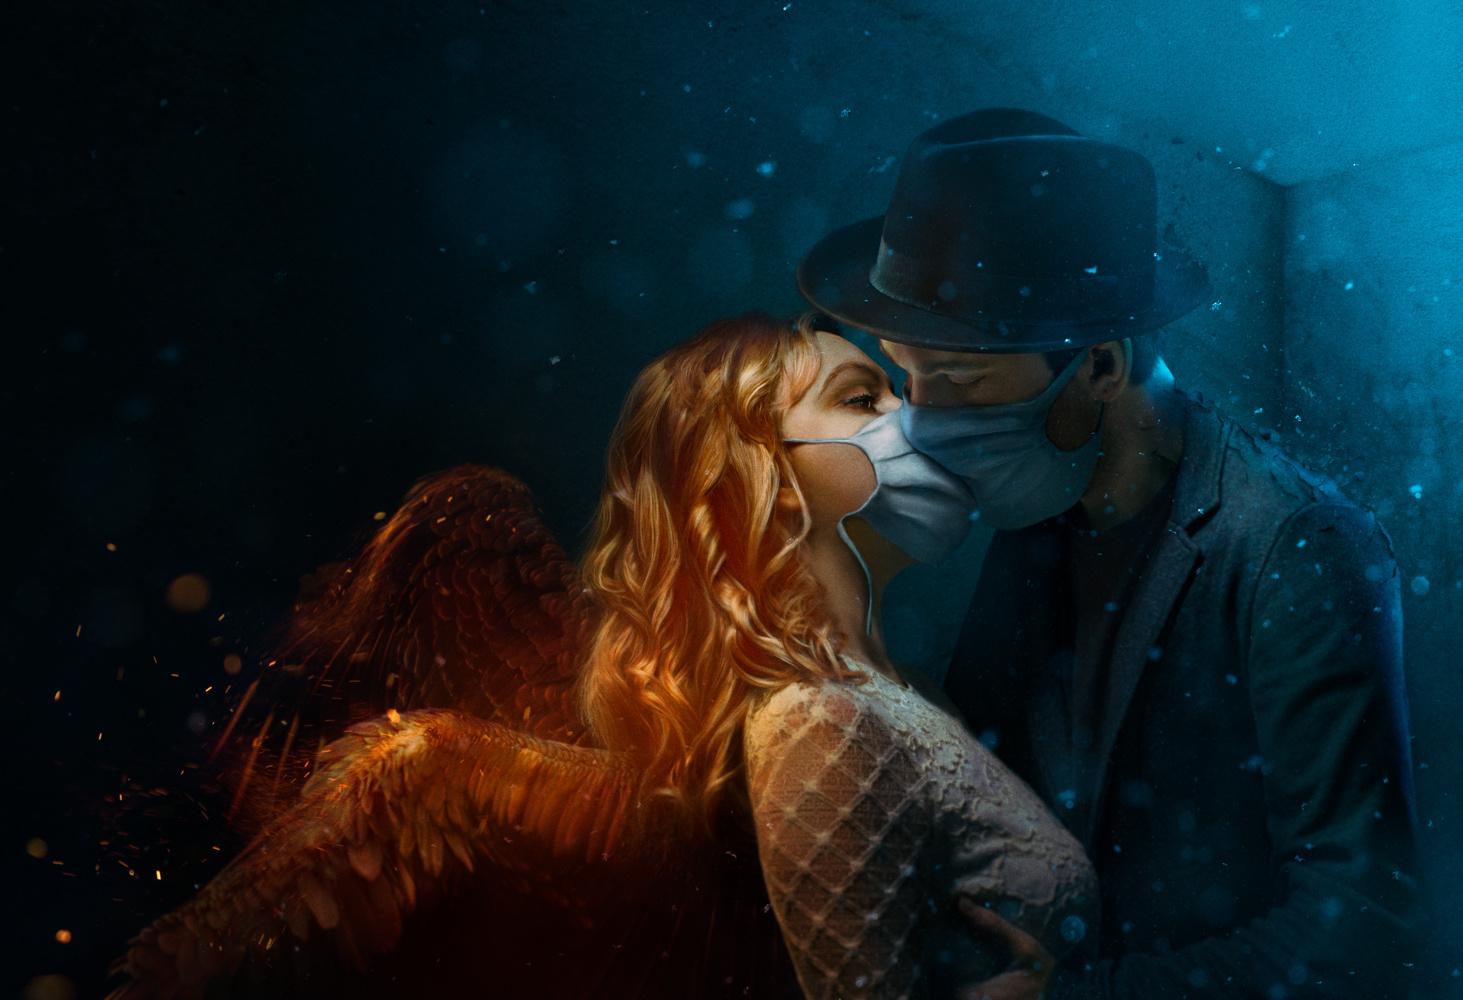 The Kiss by Kristina Stankeviciute-Polezajeva